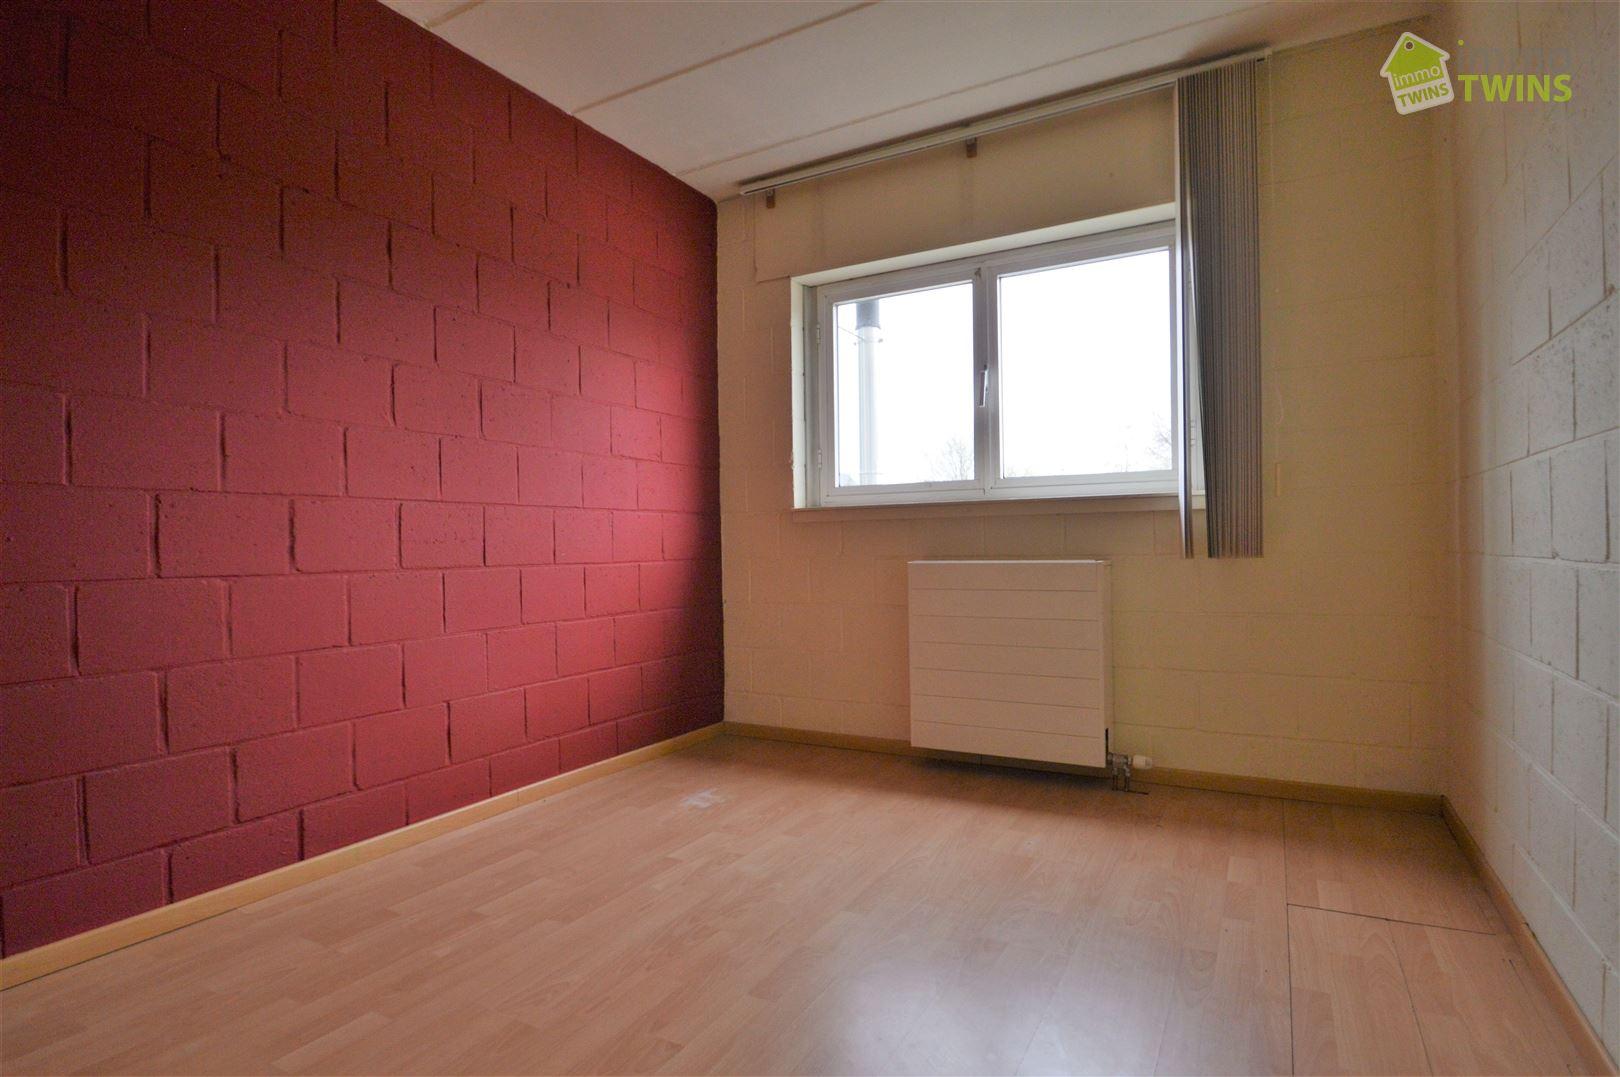 Foto 6 : Appartement te 9200 SINT-GILLIS-DENDERMONDE (België) - Prijs € 535